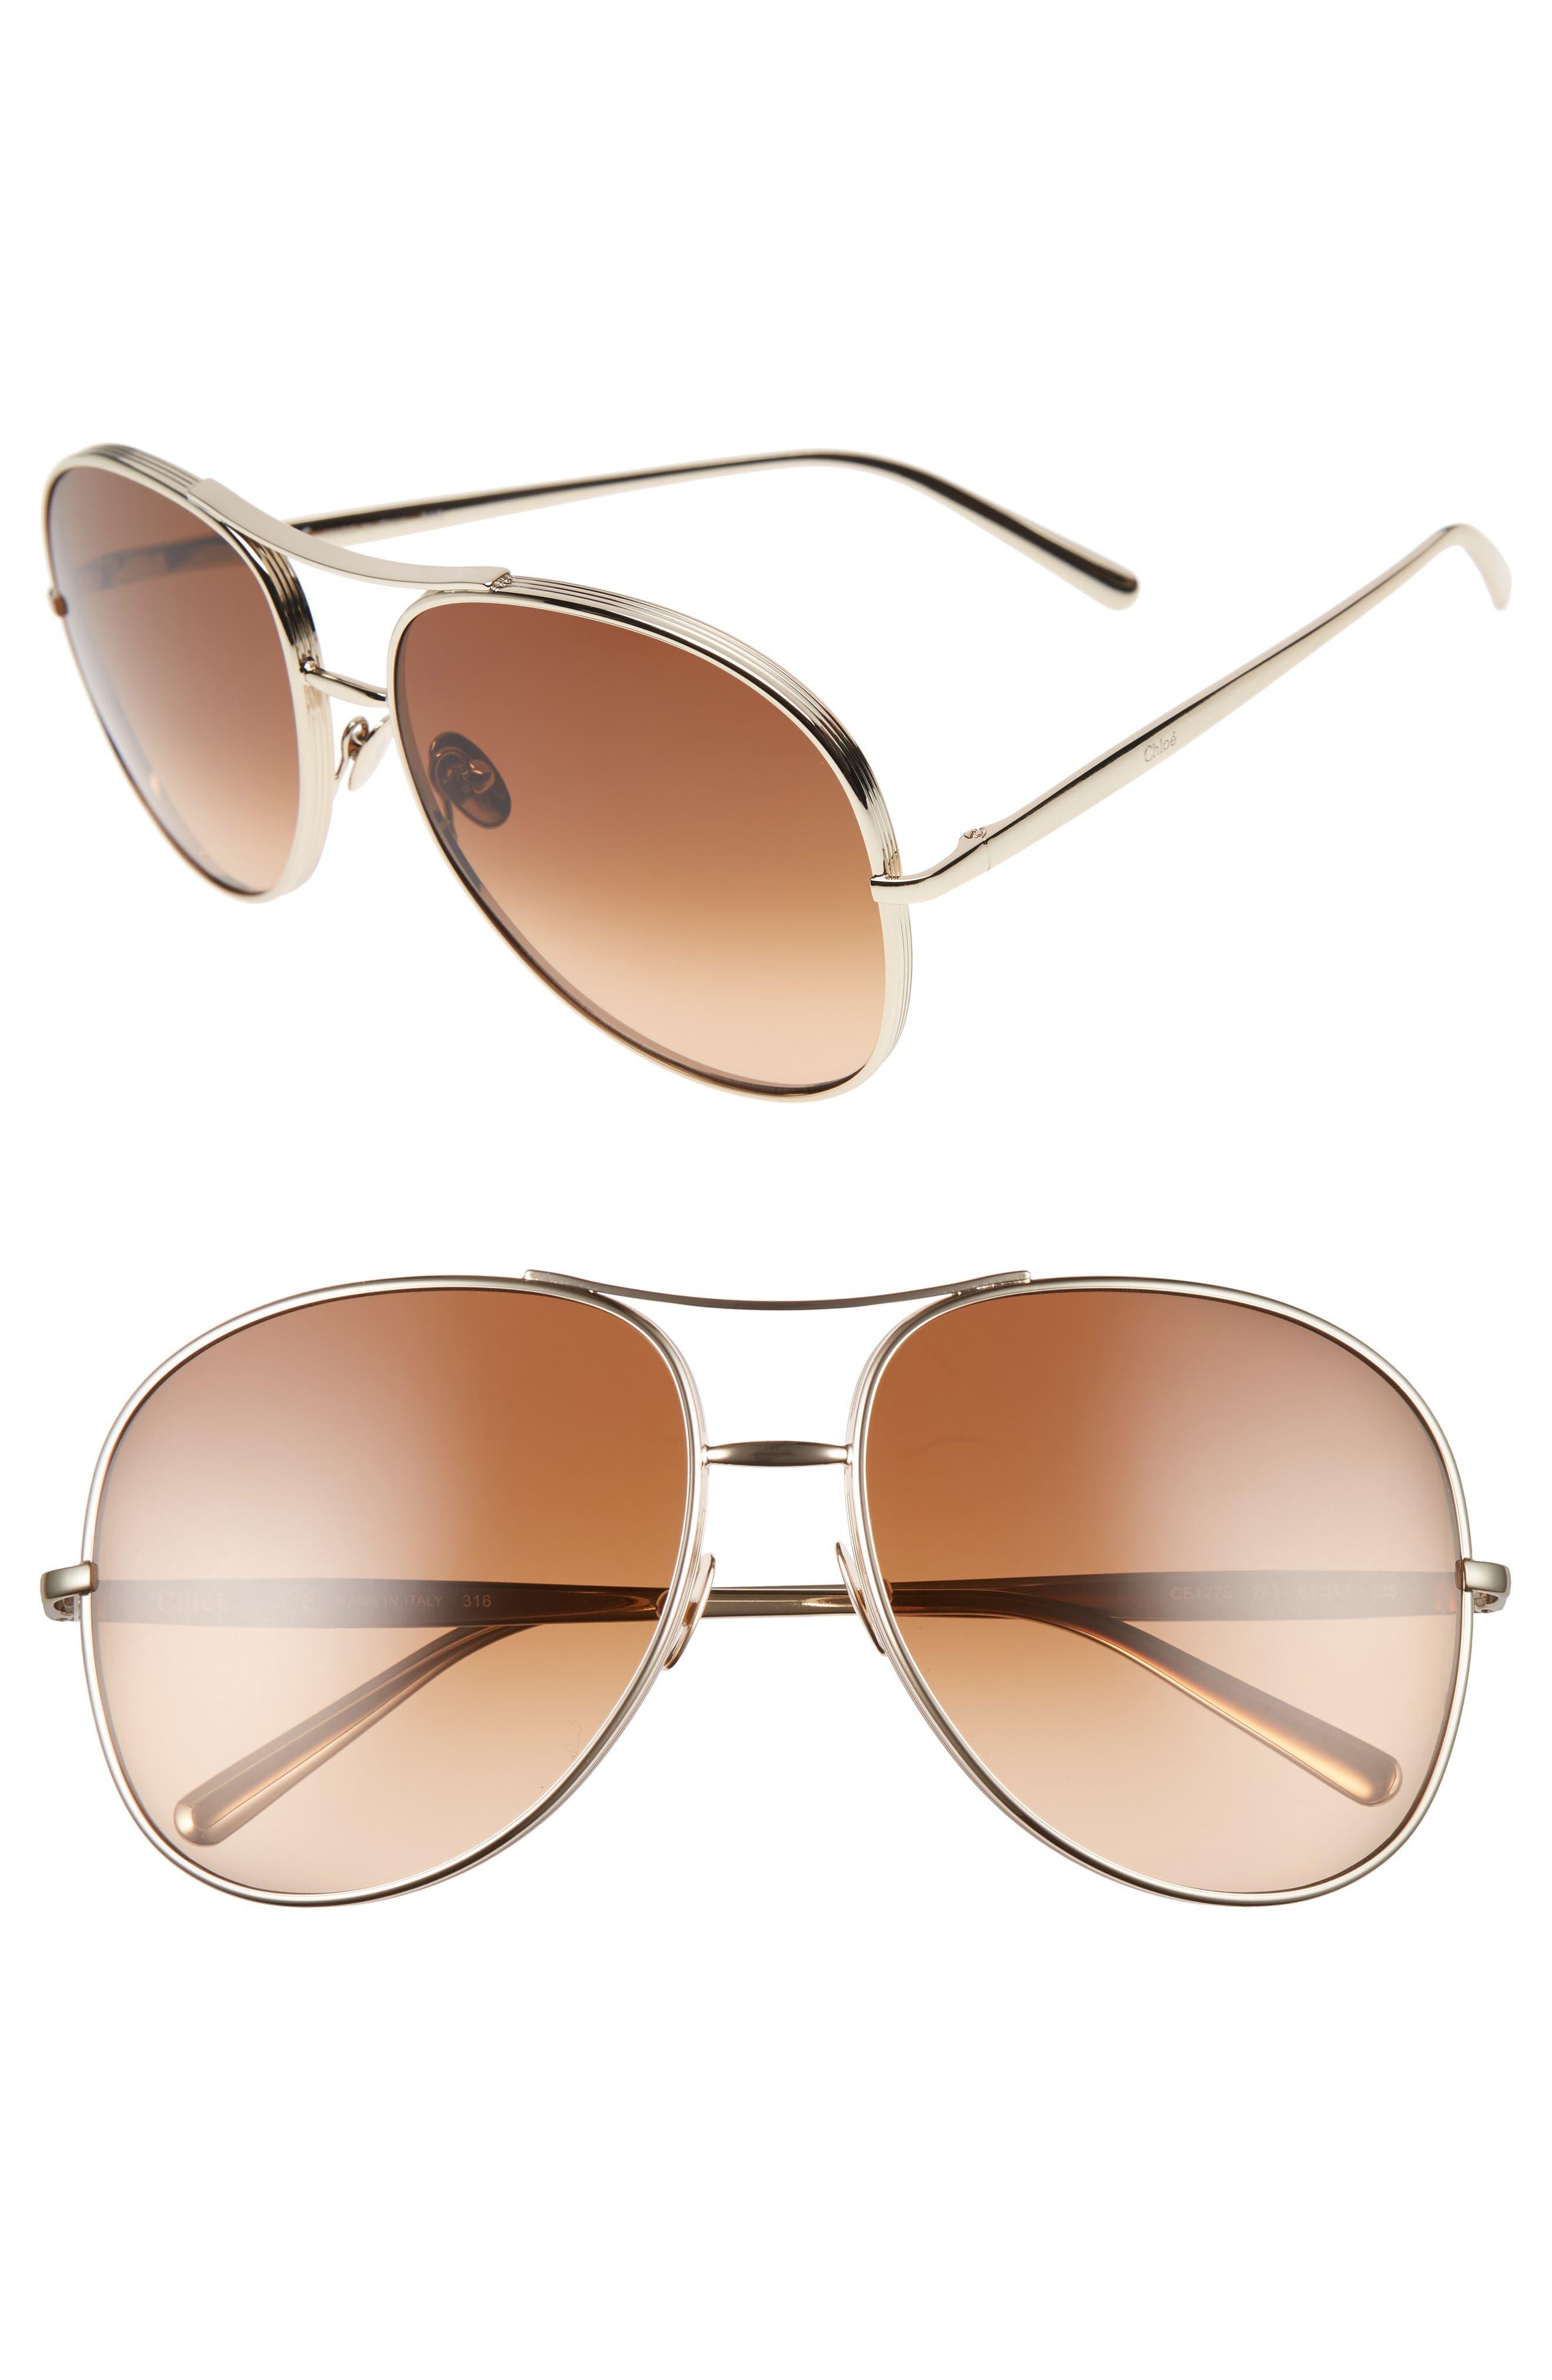 61mm Oversize Sunglasses,                         Main,                         color,